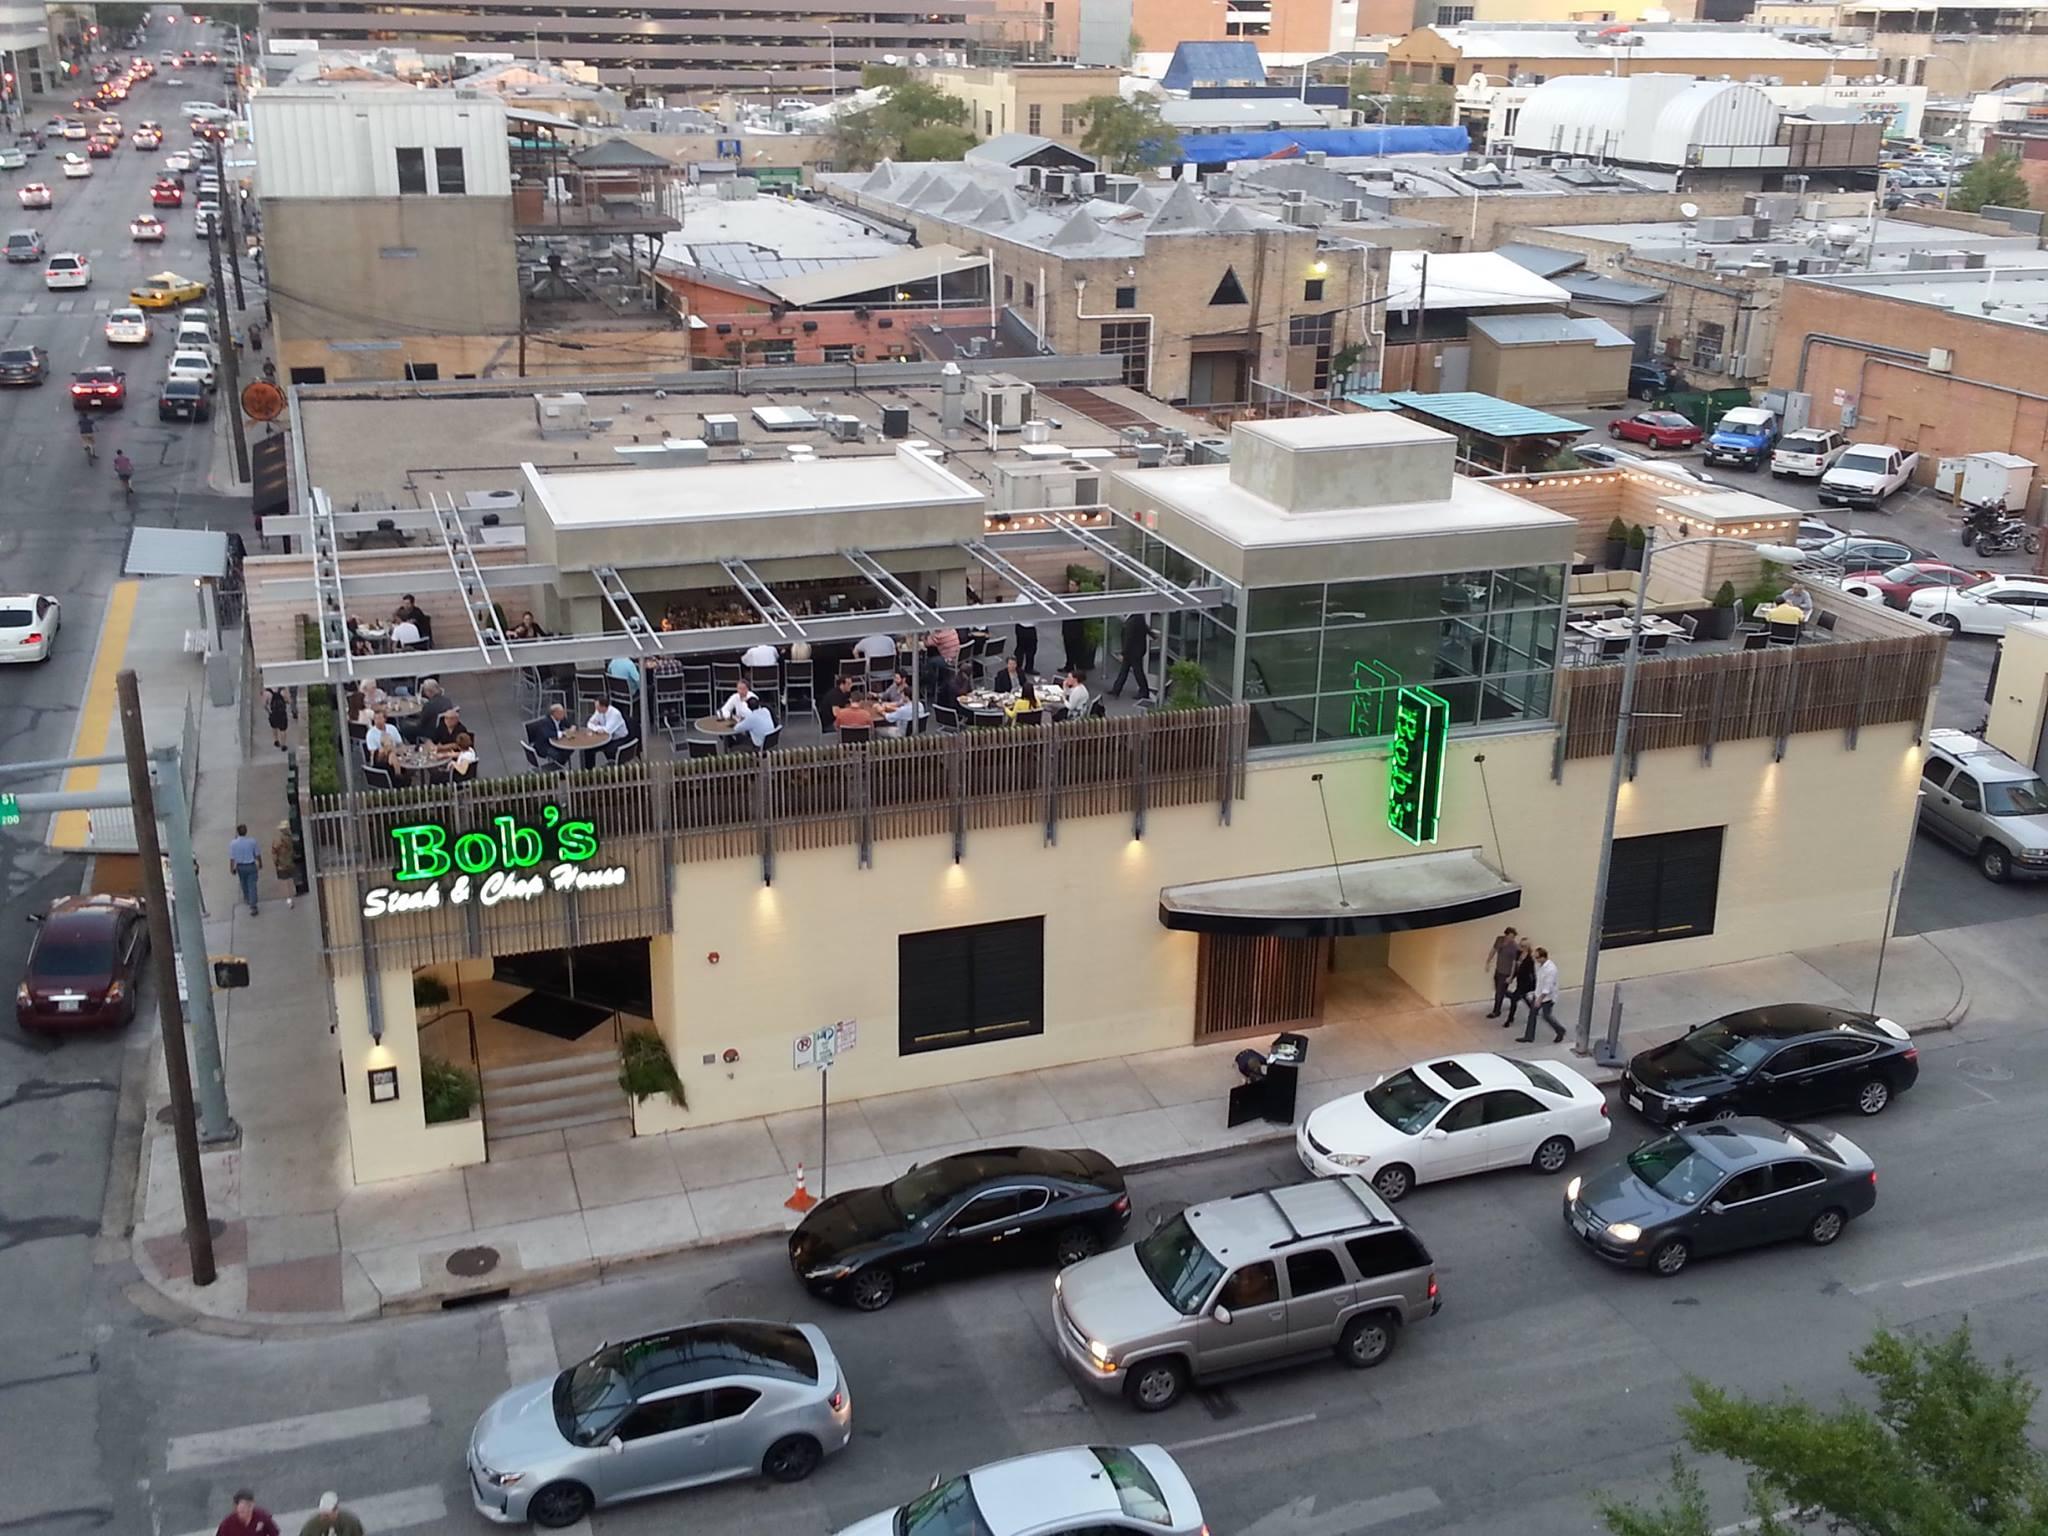 10 Best Rooftop Dining Restaurants In Austin